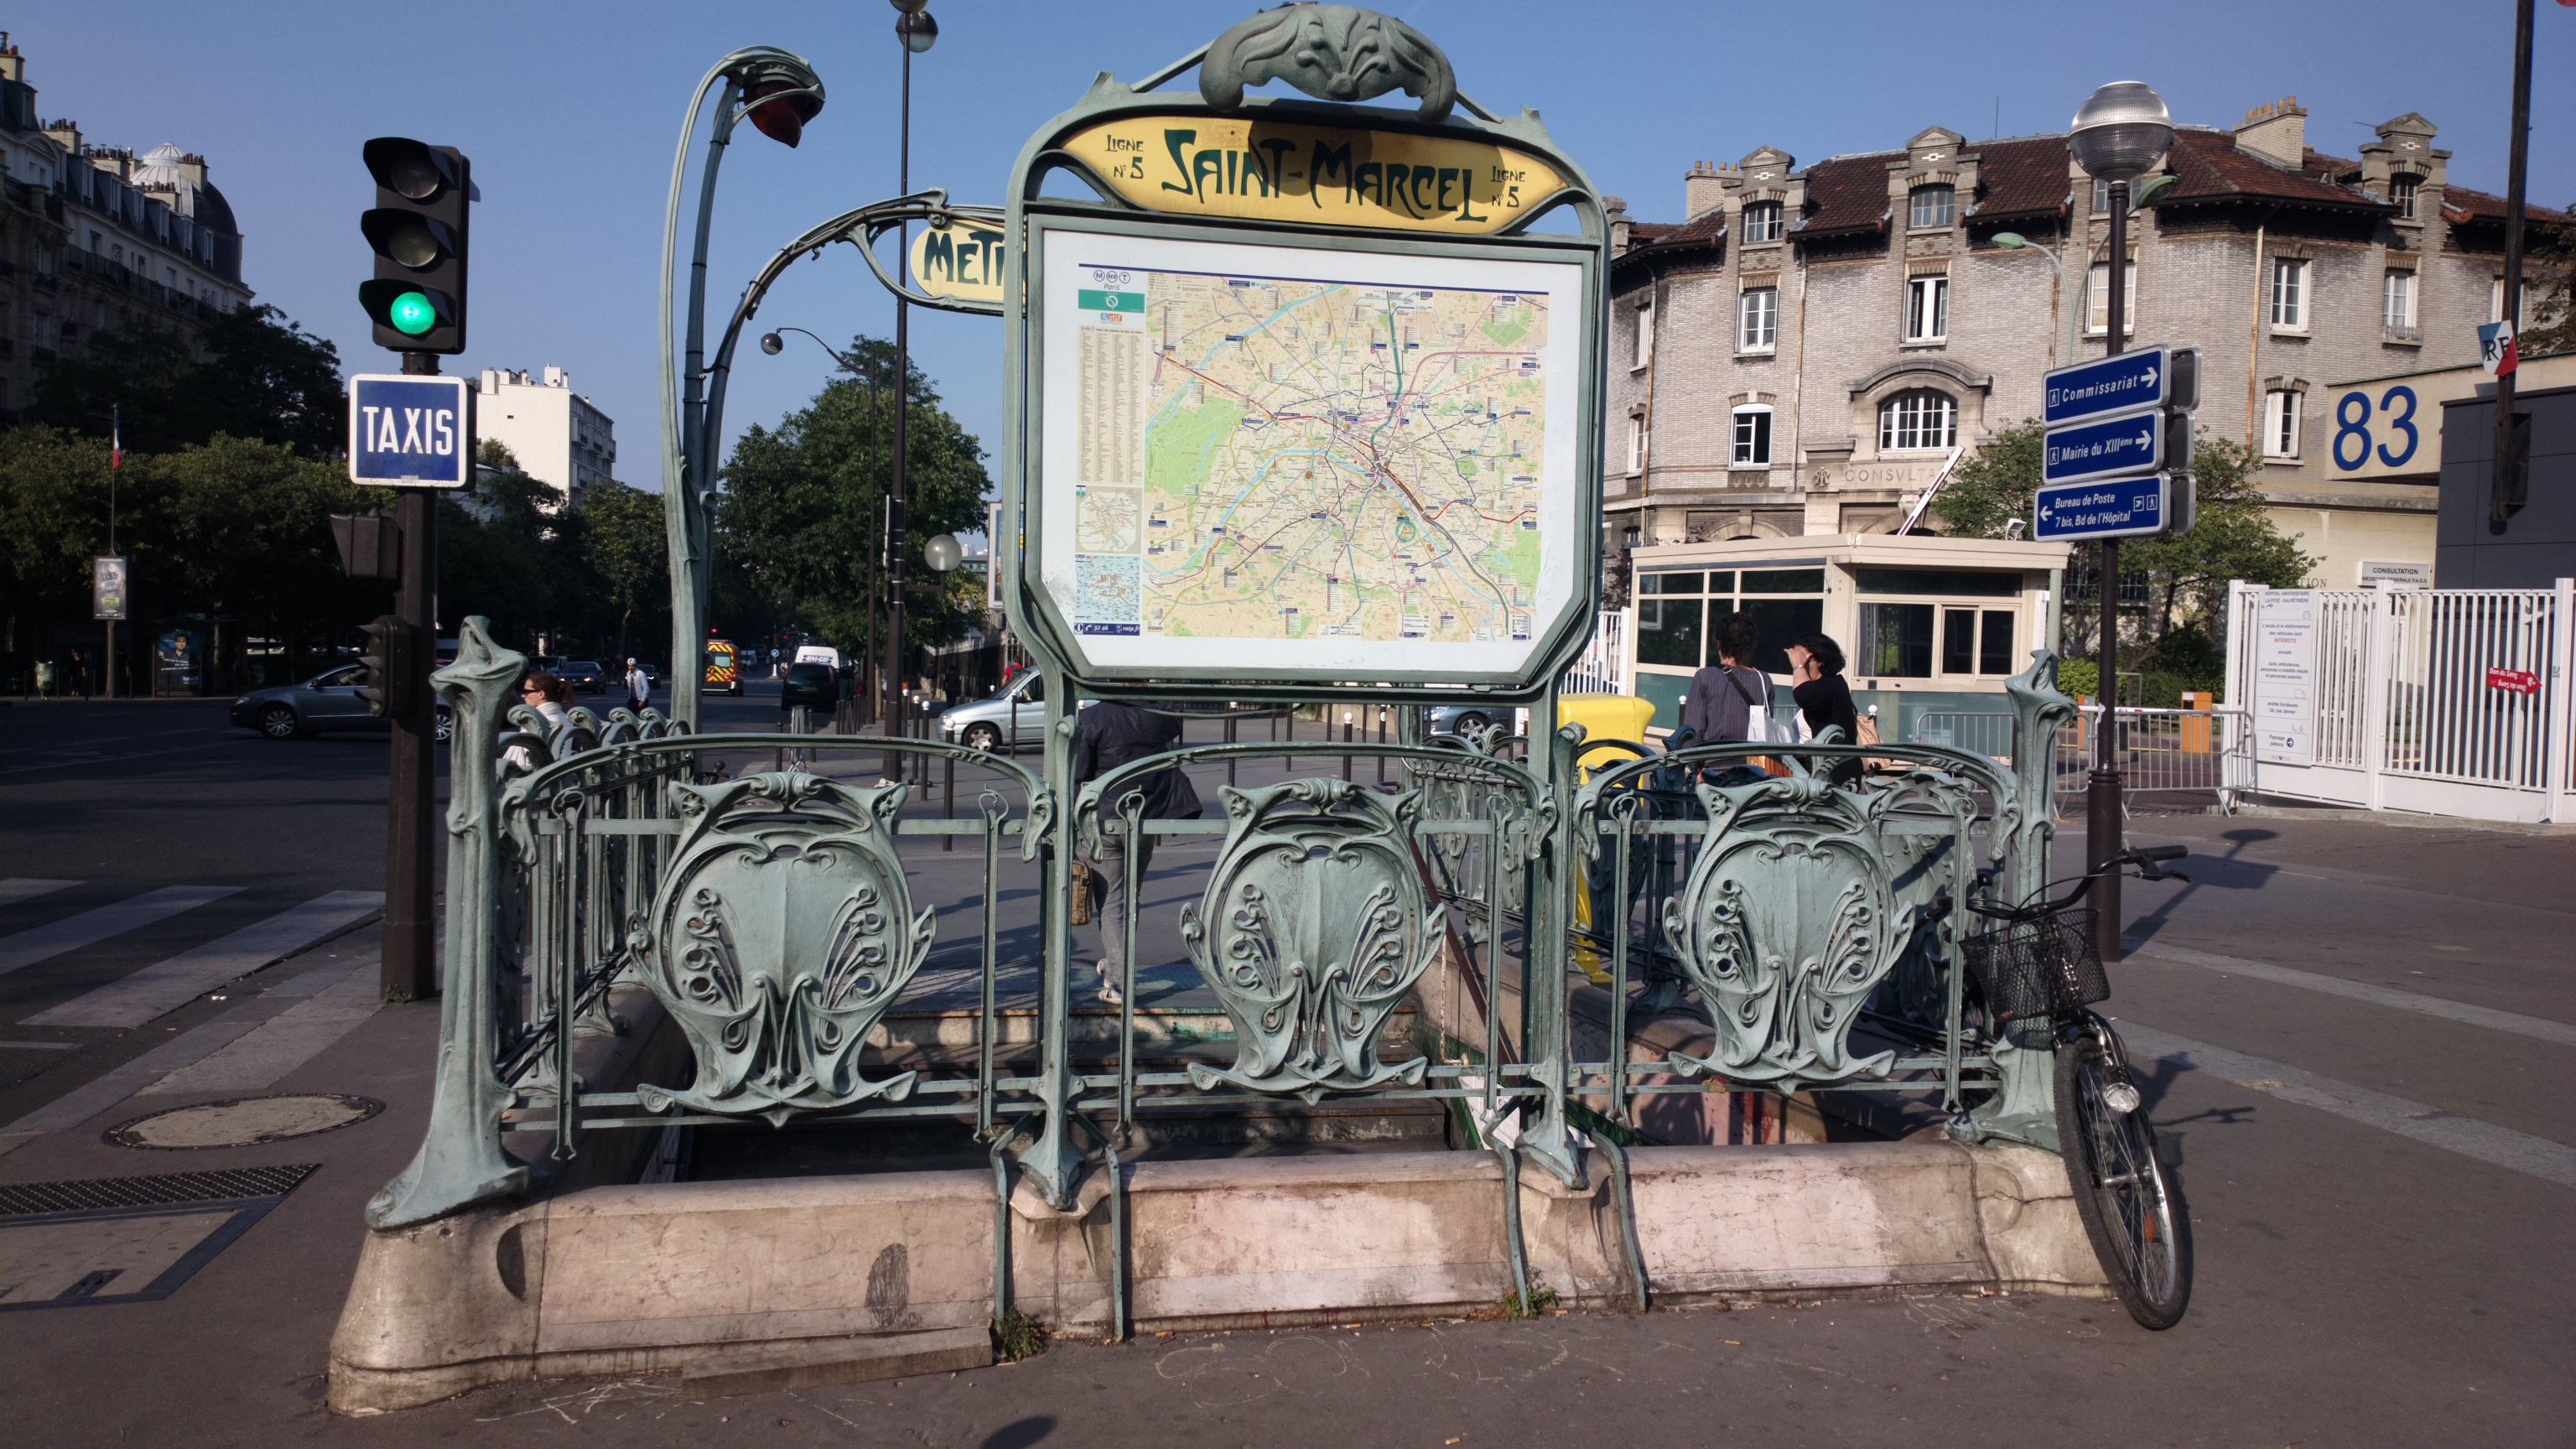 file saint marcel paris metro wikimedia commons. Black Bedroom Furniture Sets. Home Design Ideas